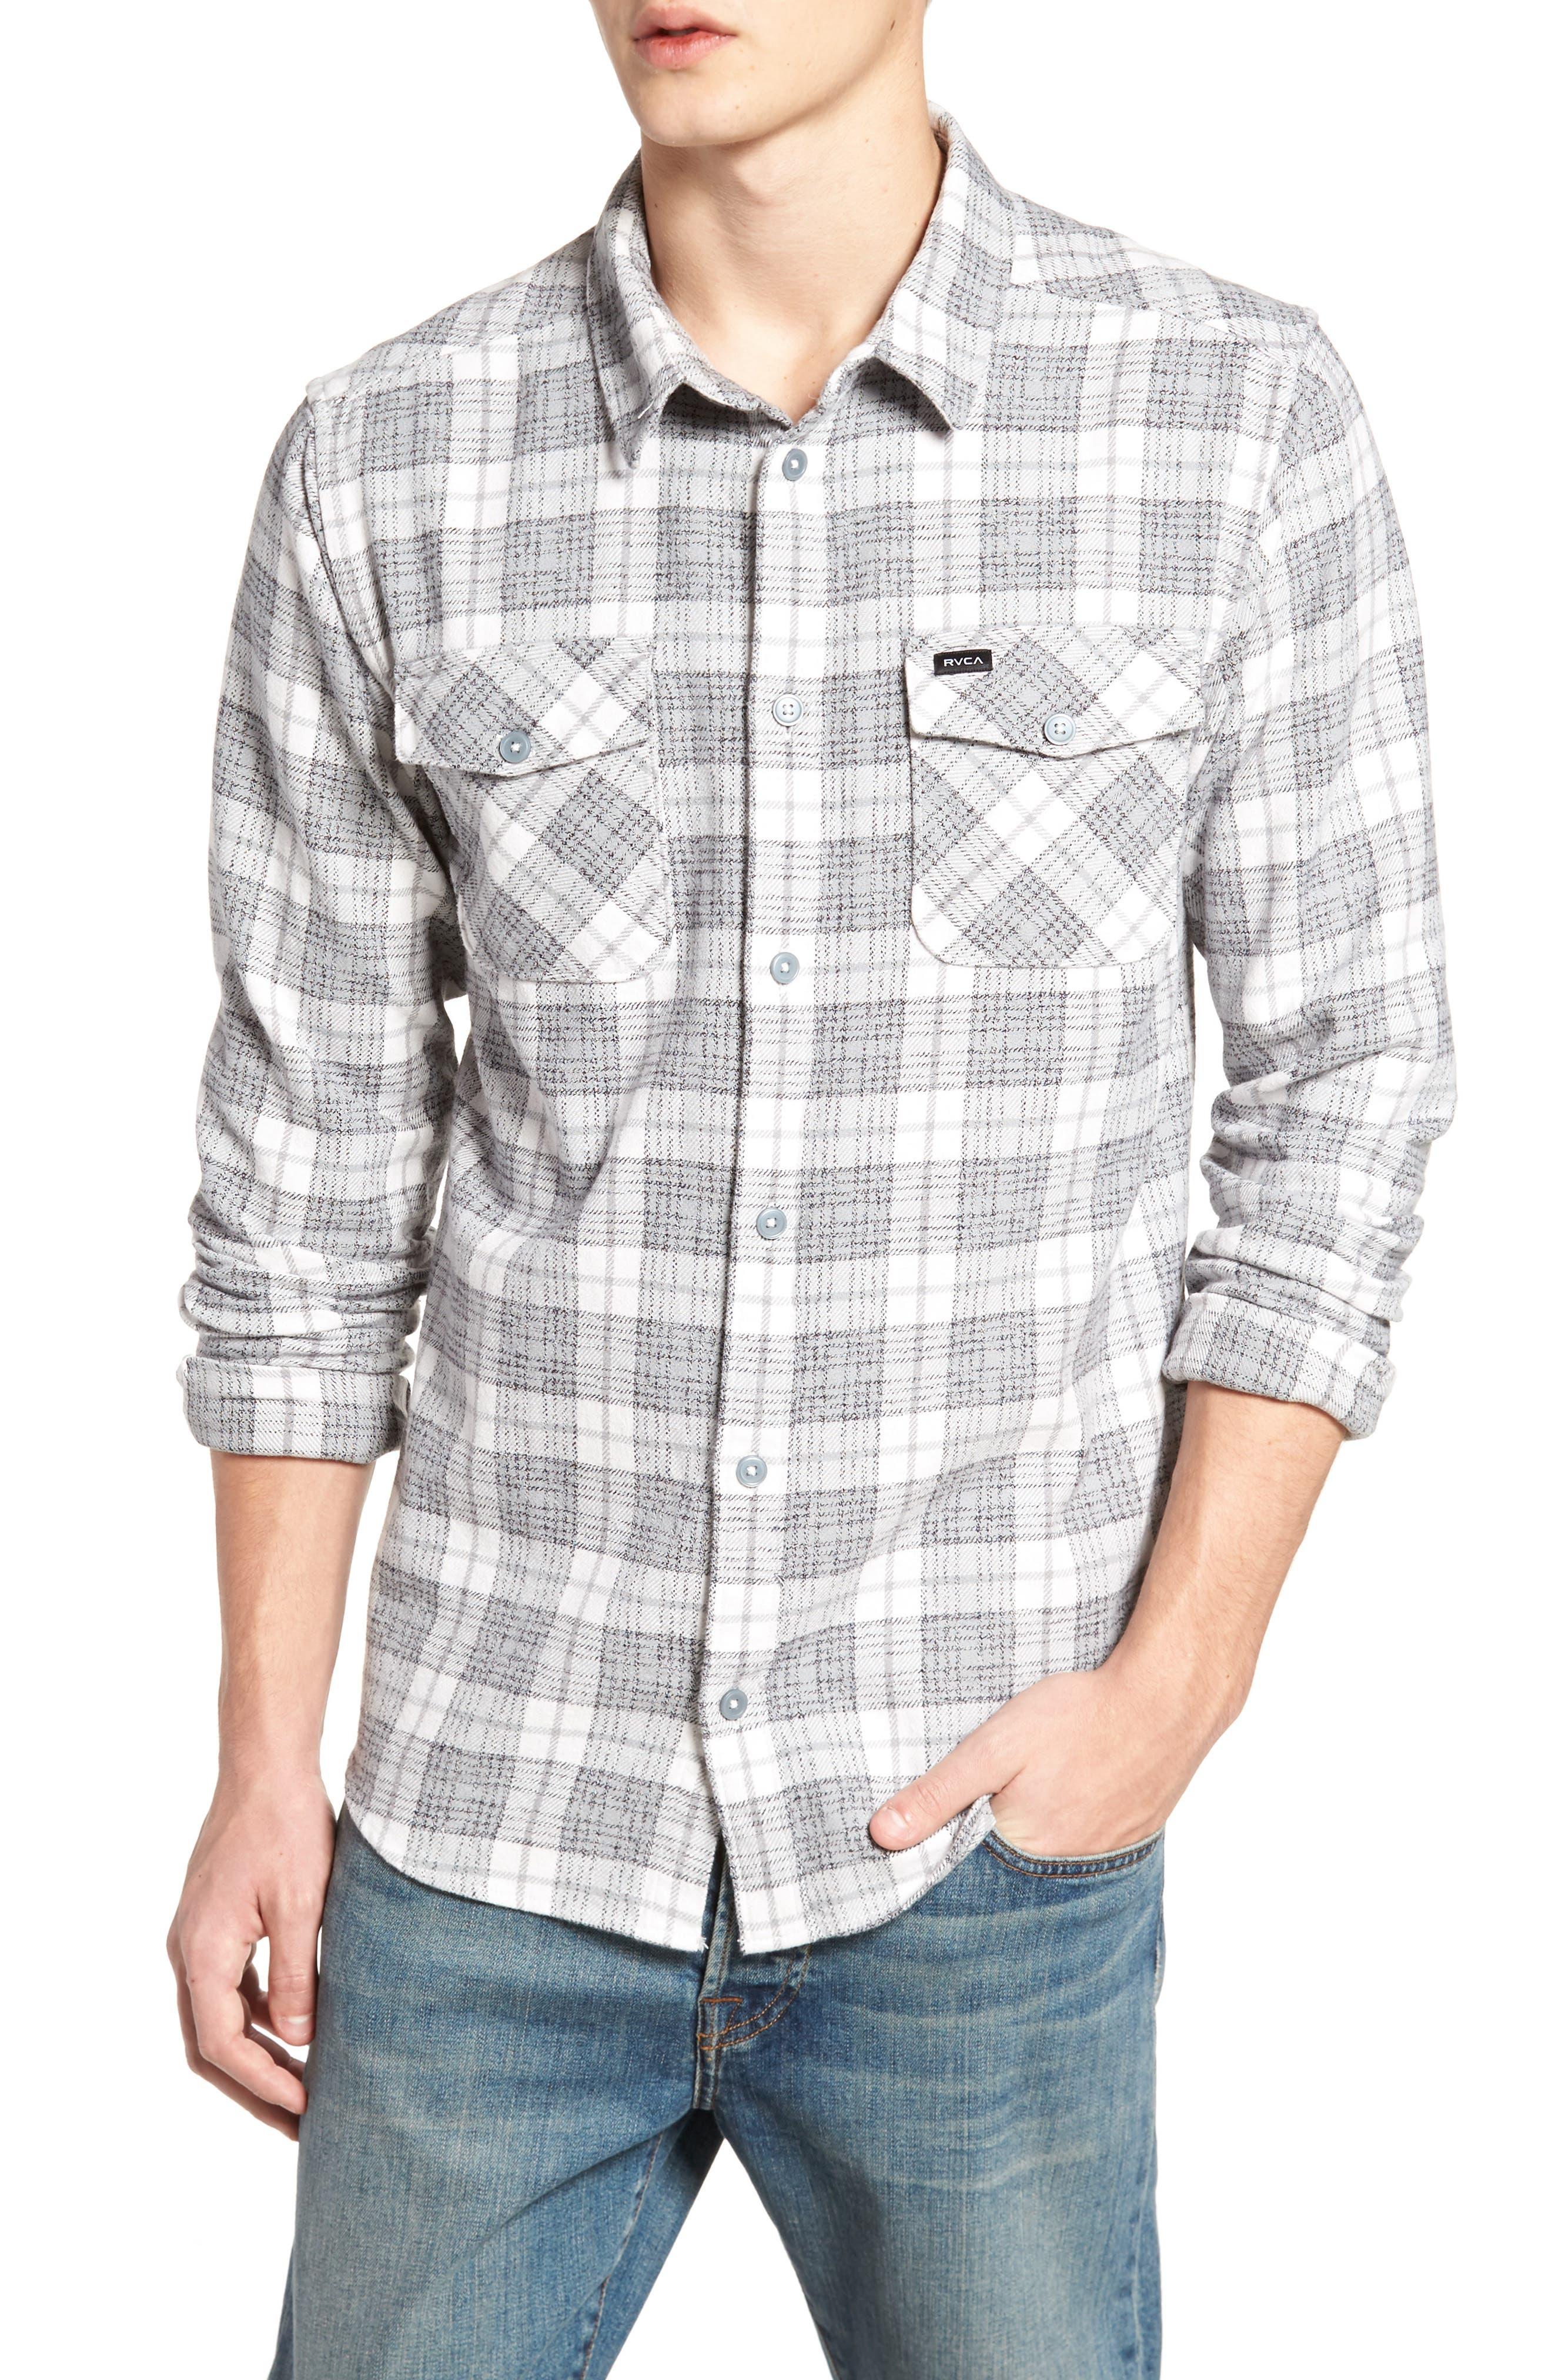 'That'll Work' Trim Fit Plaid Flannel Shirt,                         Main,                         color, ANTIQUE WHITE